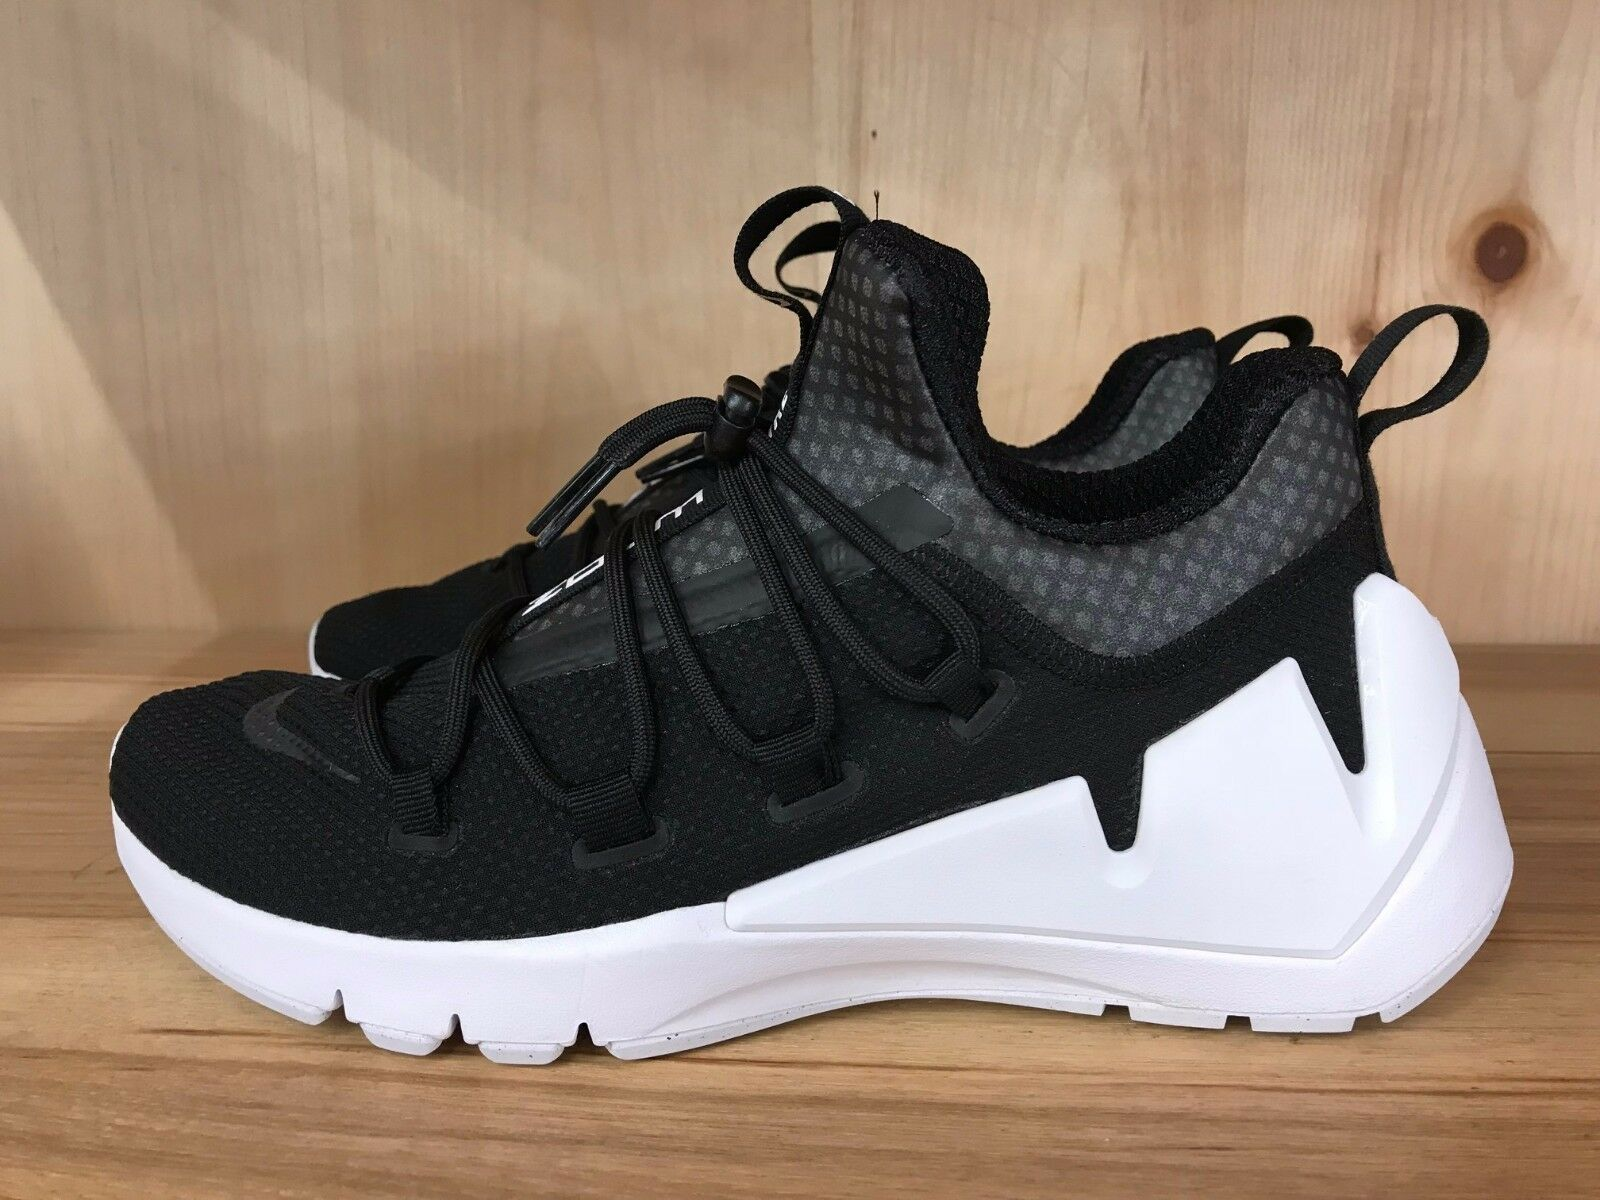 Nike air zoom elementare terra humara retro bianco nero 924465-001 gli 8 e i 13 uomini sz